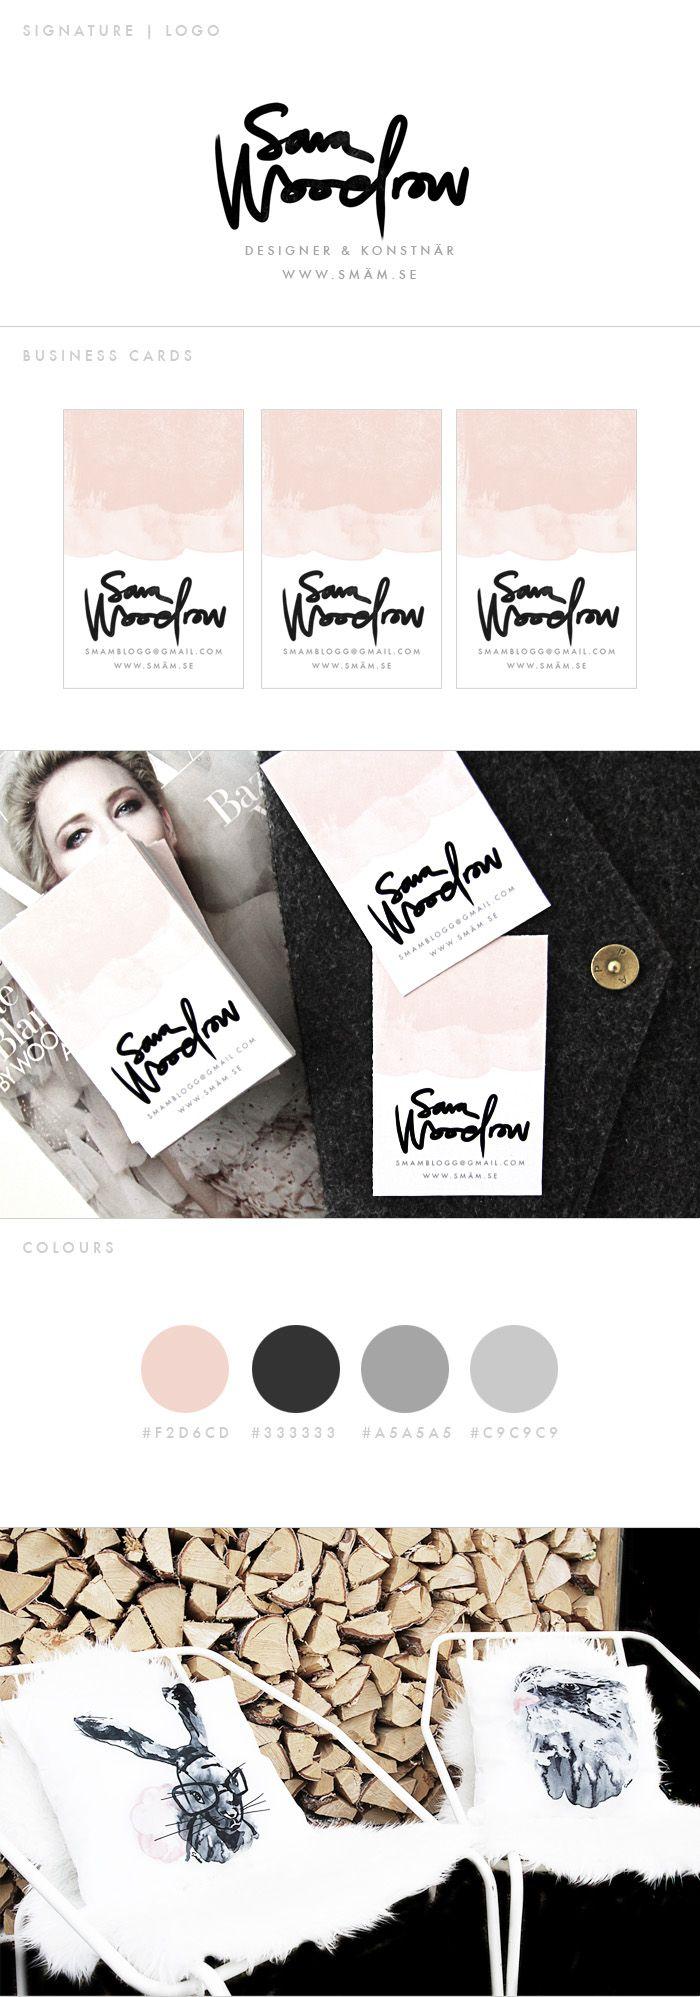 HELLO! MY NAME IS SARA - SMÄM /// #businesscard #logo